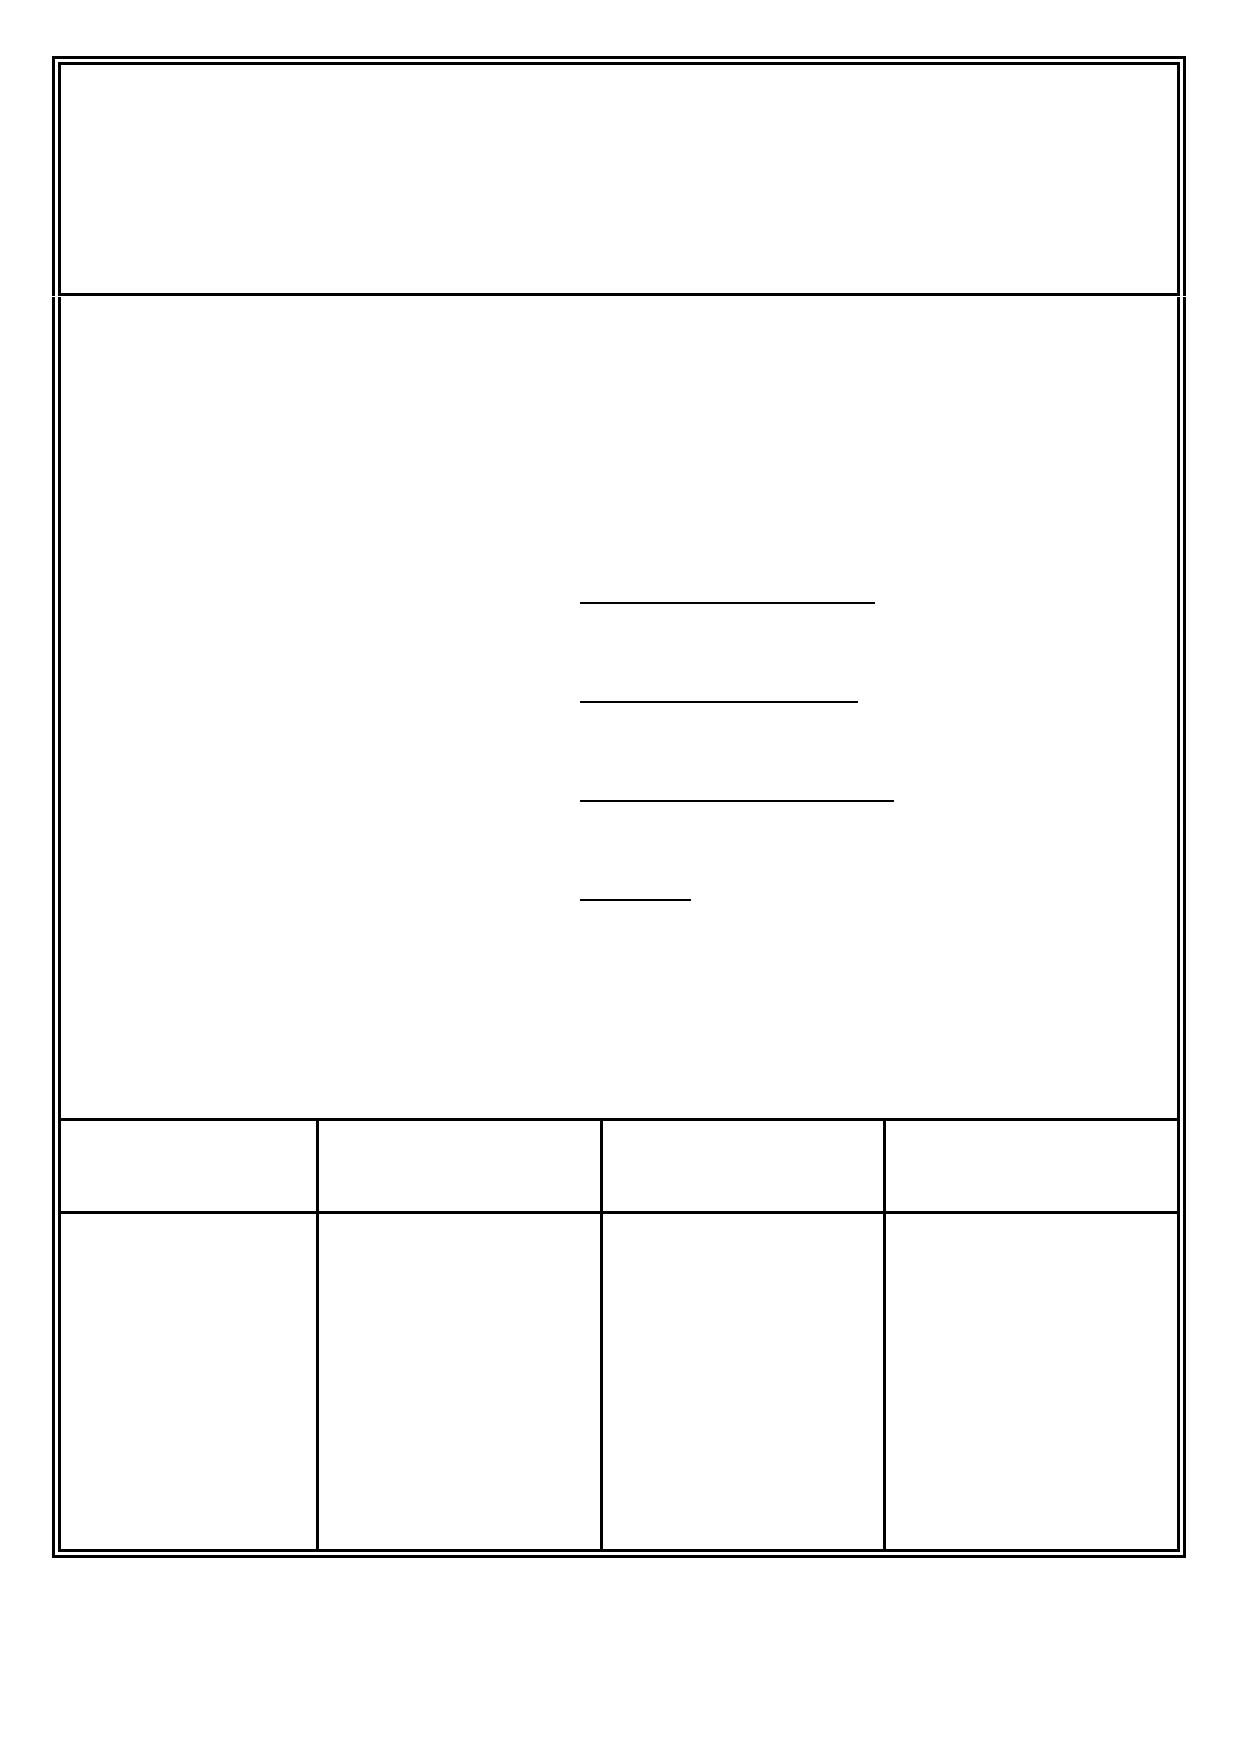 PC2004LRS-BSO-B datasheet